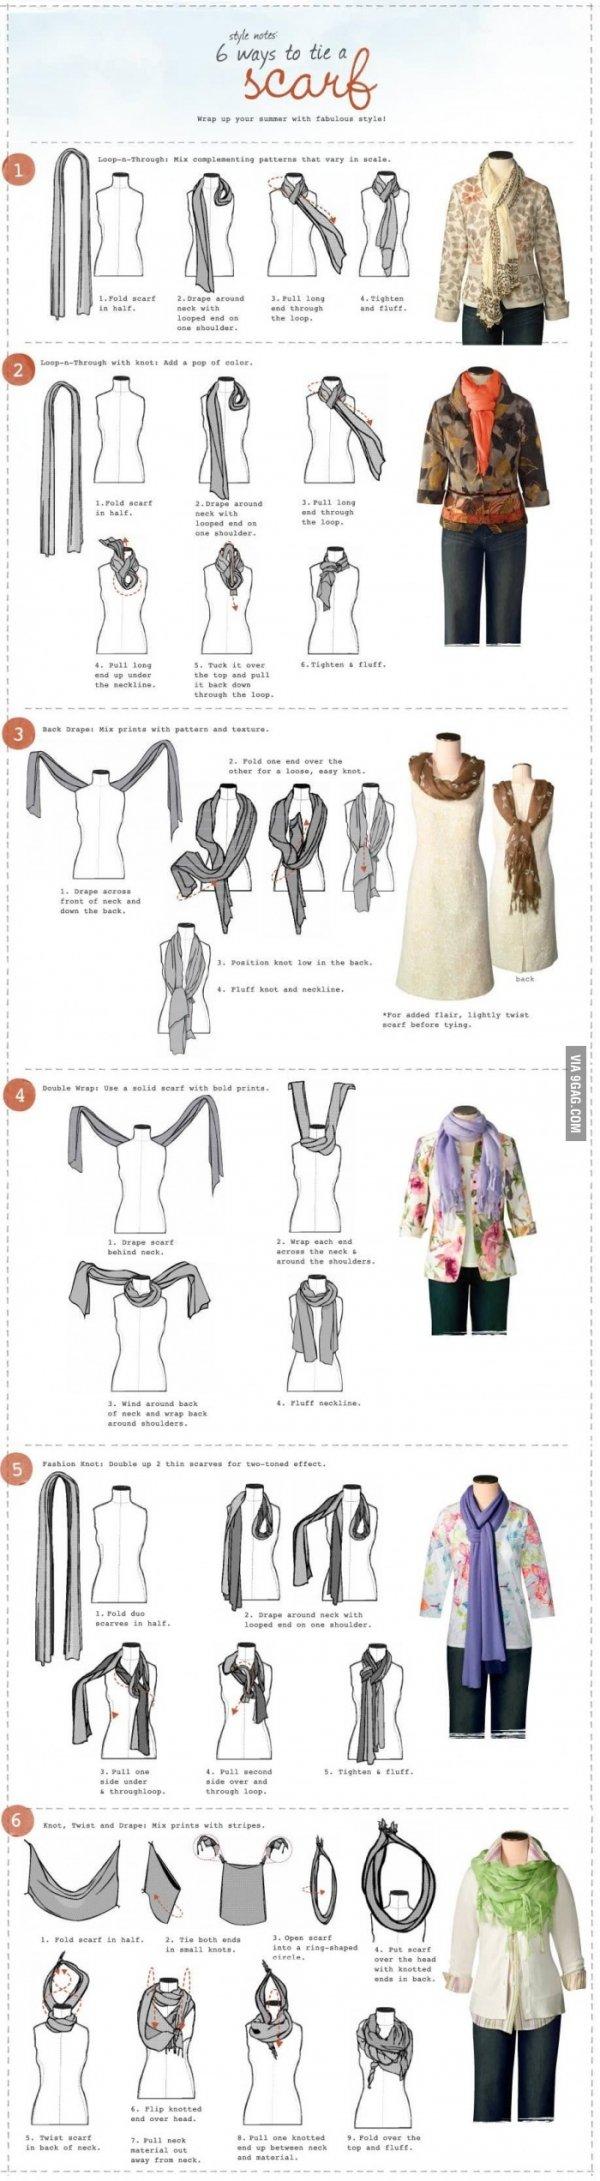 One Infographic, Six Ways